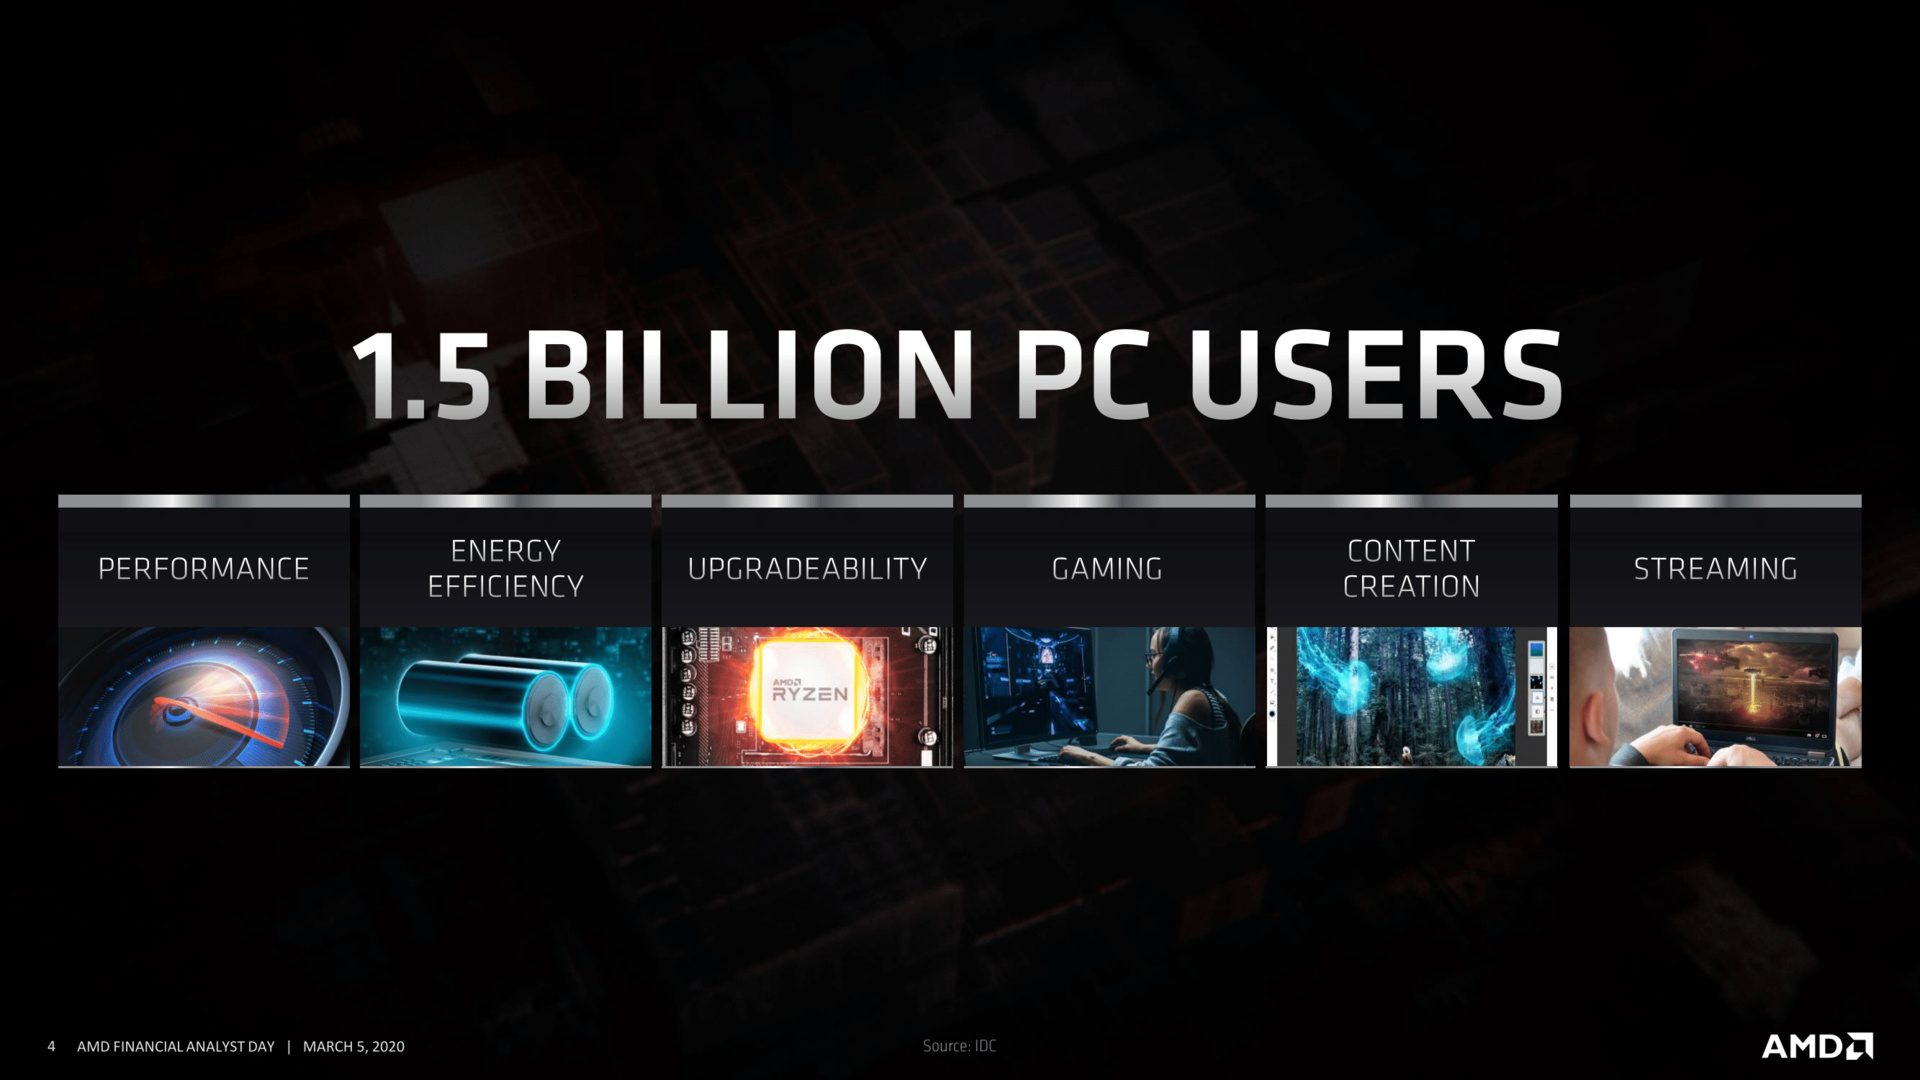 Rick Bergman: Driving Growth Across PCs and Gaming